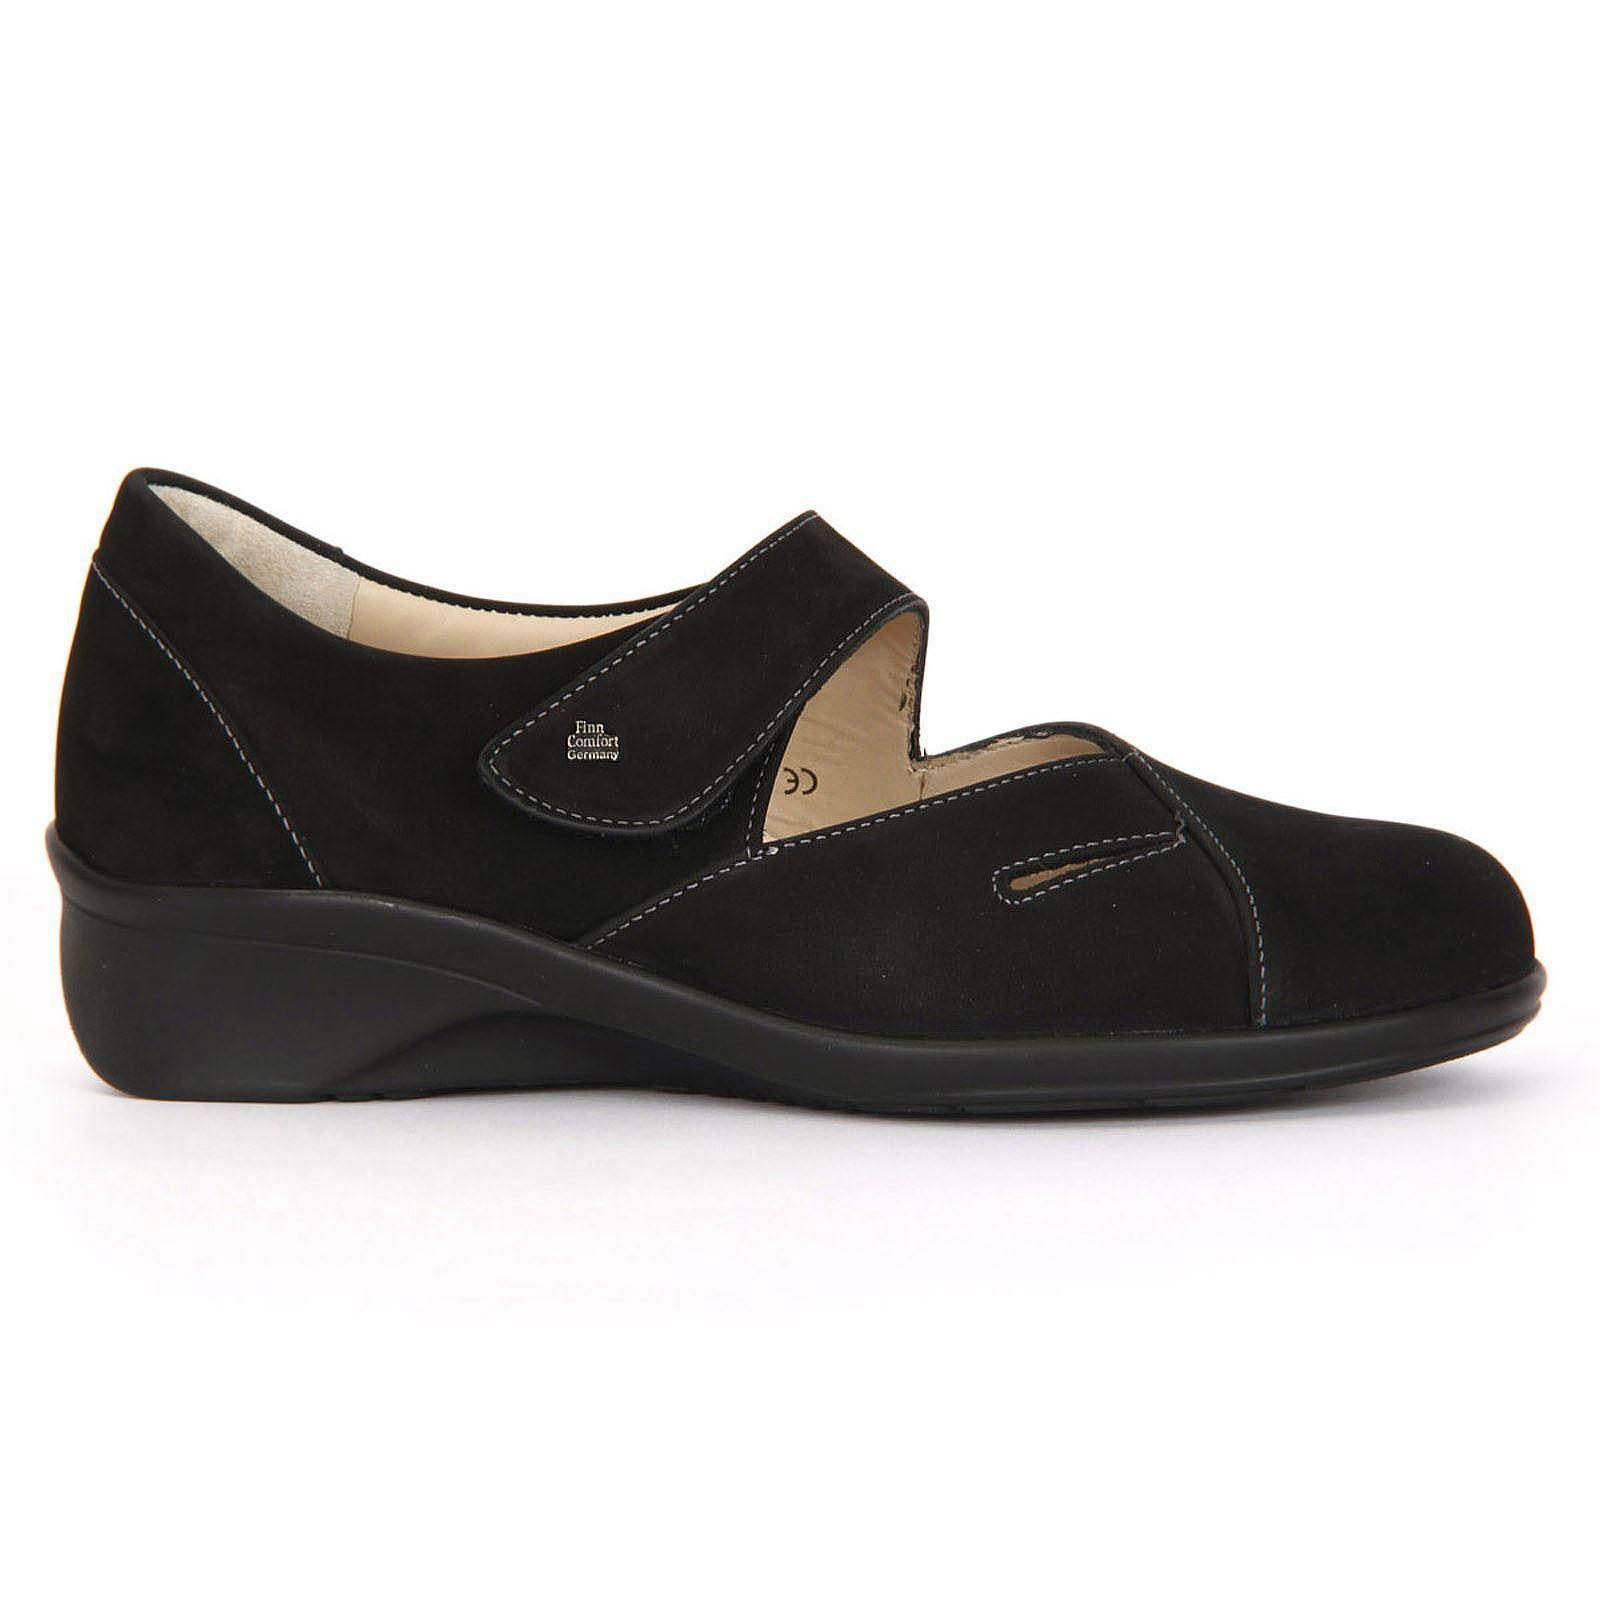 Finn Comfort Talla Aquila 3594 Negro Mujeres Mary Jane Zapatos Talla Comfort 2.5-8.5 Reino Unido Nubuck fbdfba